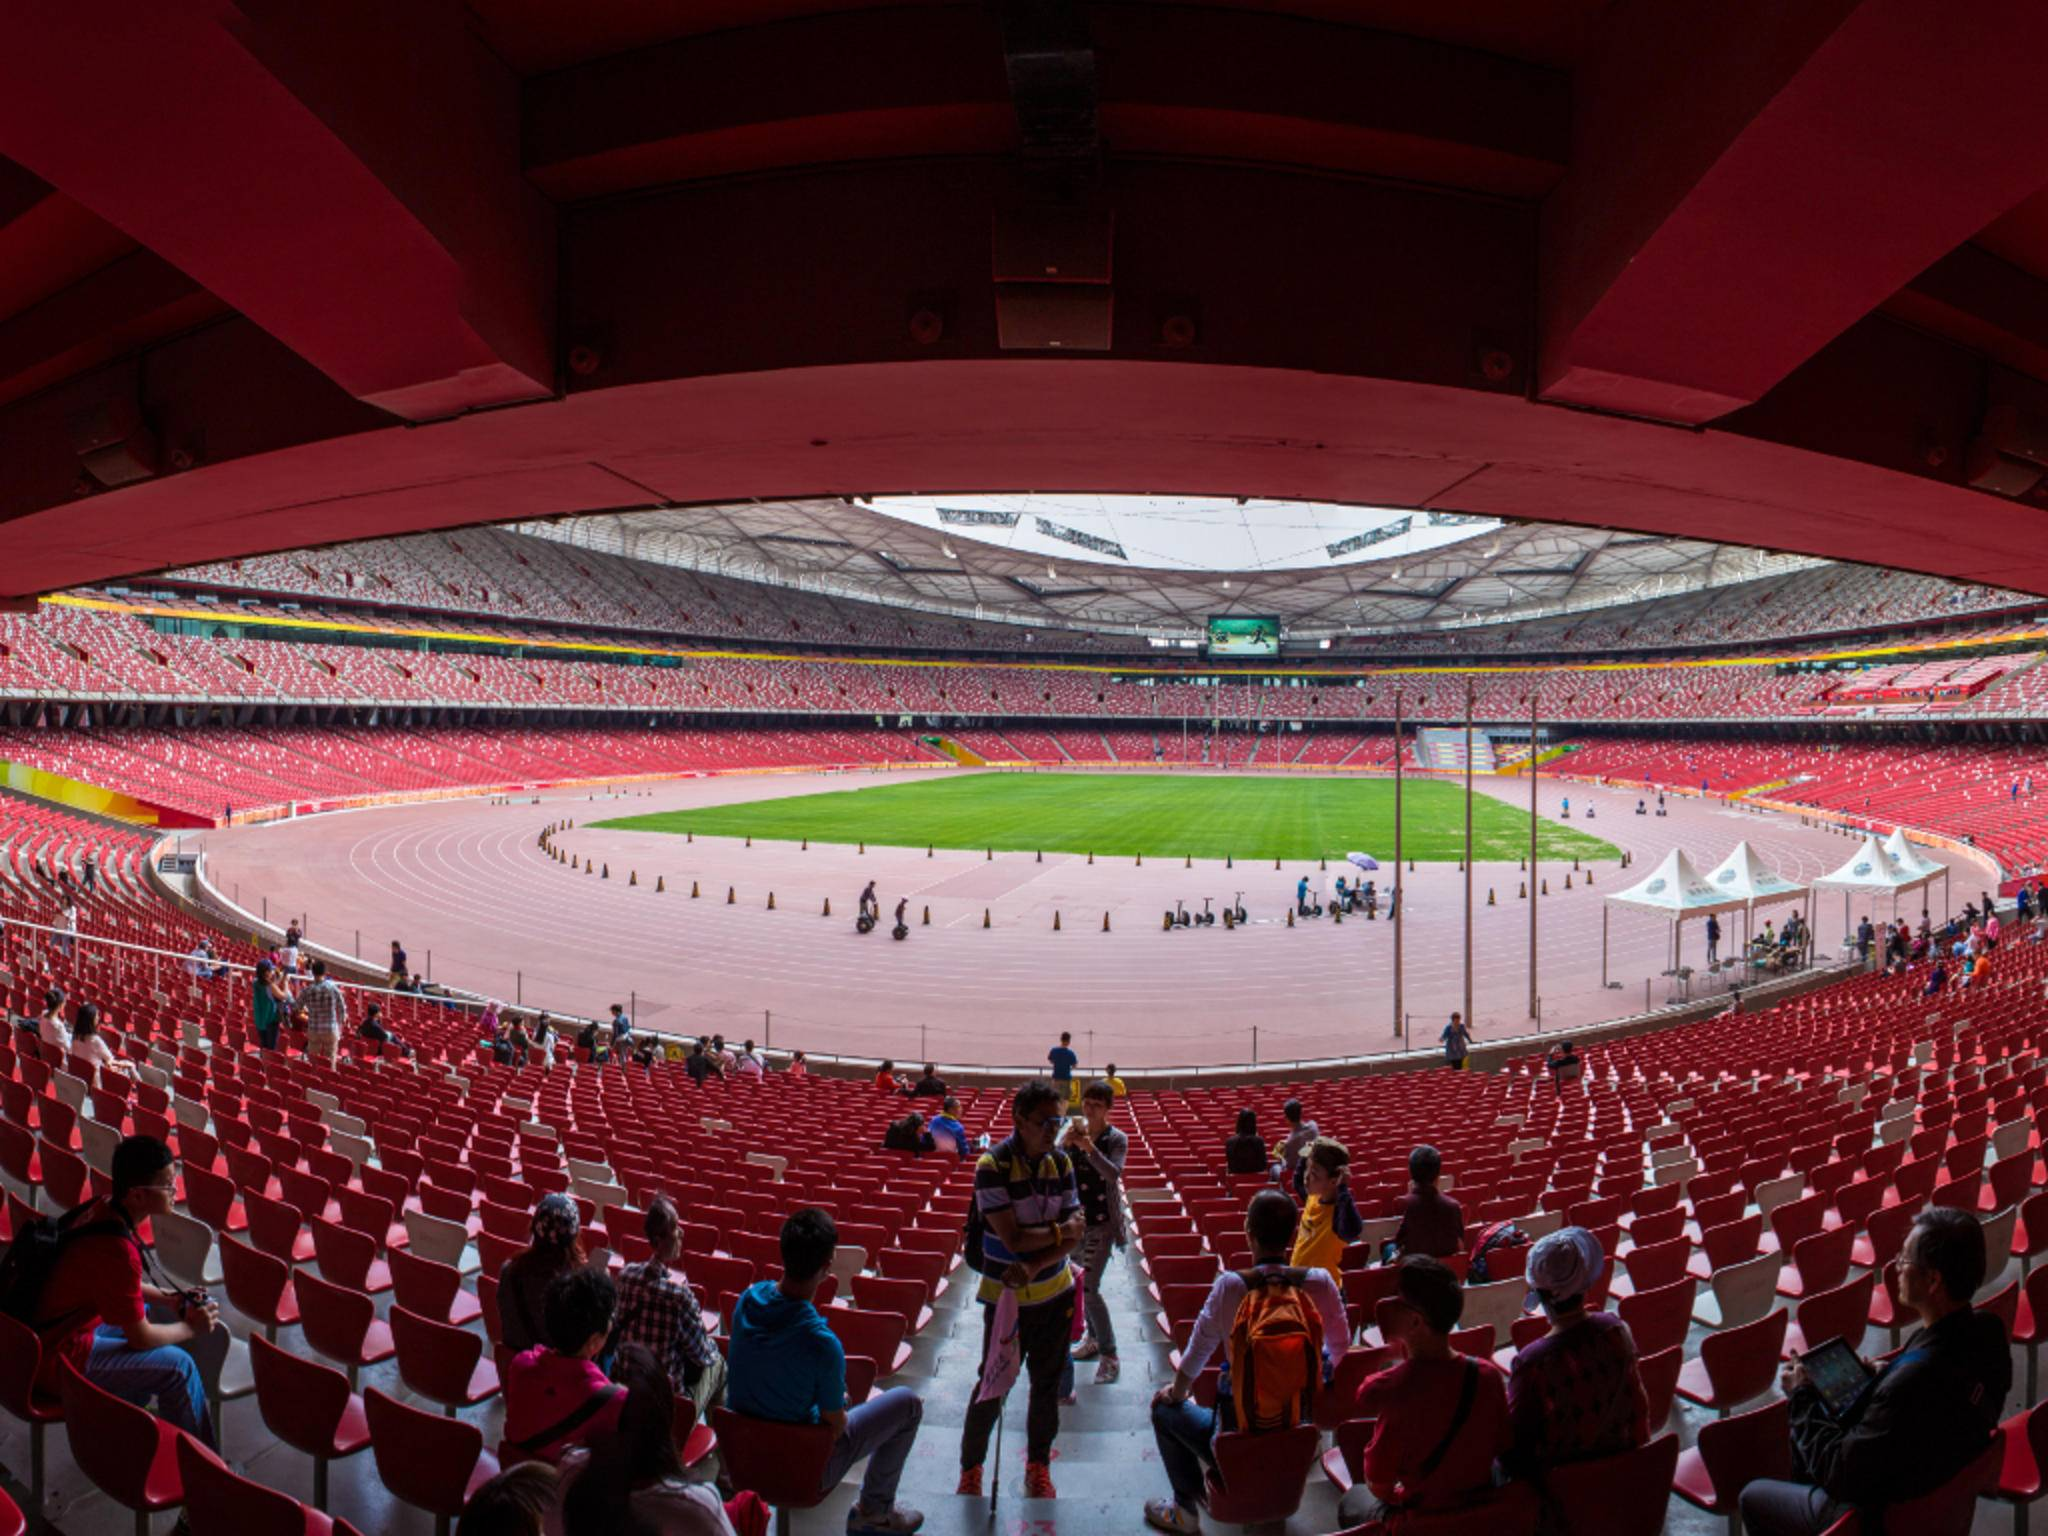 Panoramafoto des Nationalstadions von Peking